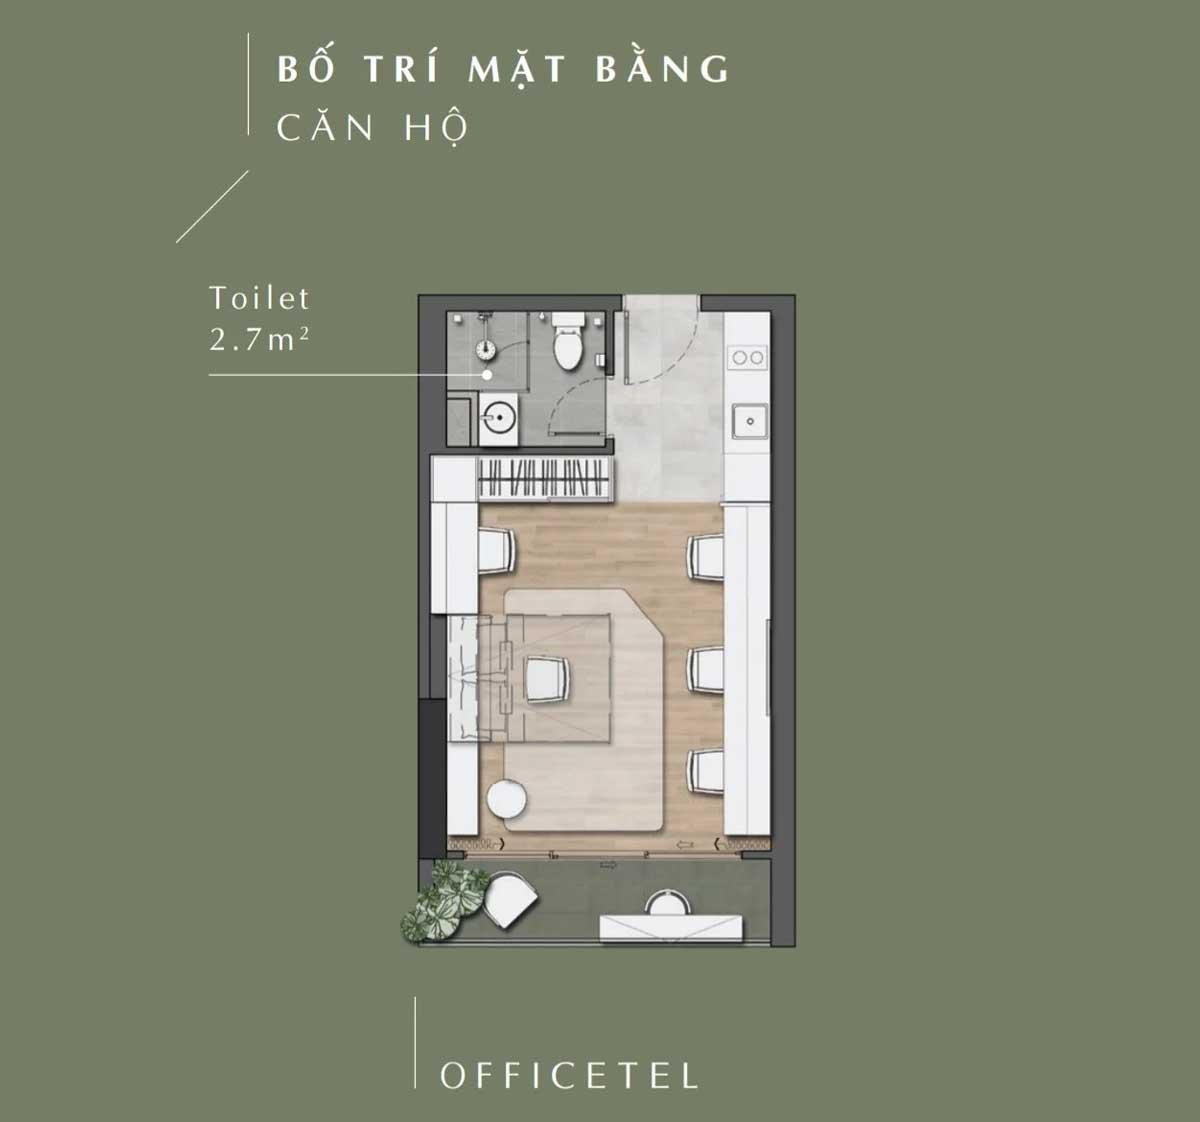 Thiet ke Can ho Officetel Lavita Thuan An - LAVITA THUẬN AN BÌNH DƯƠNG